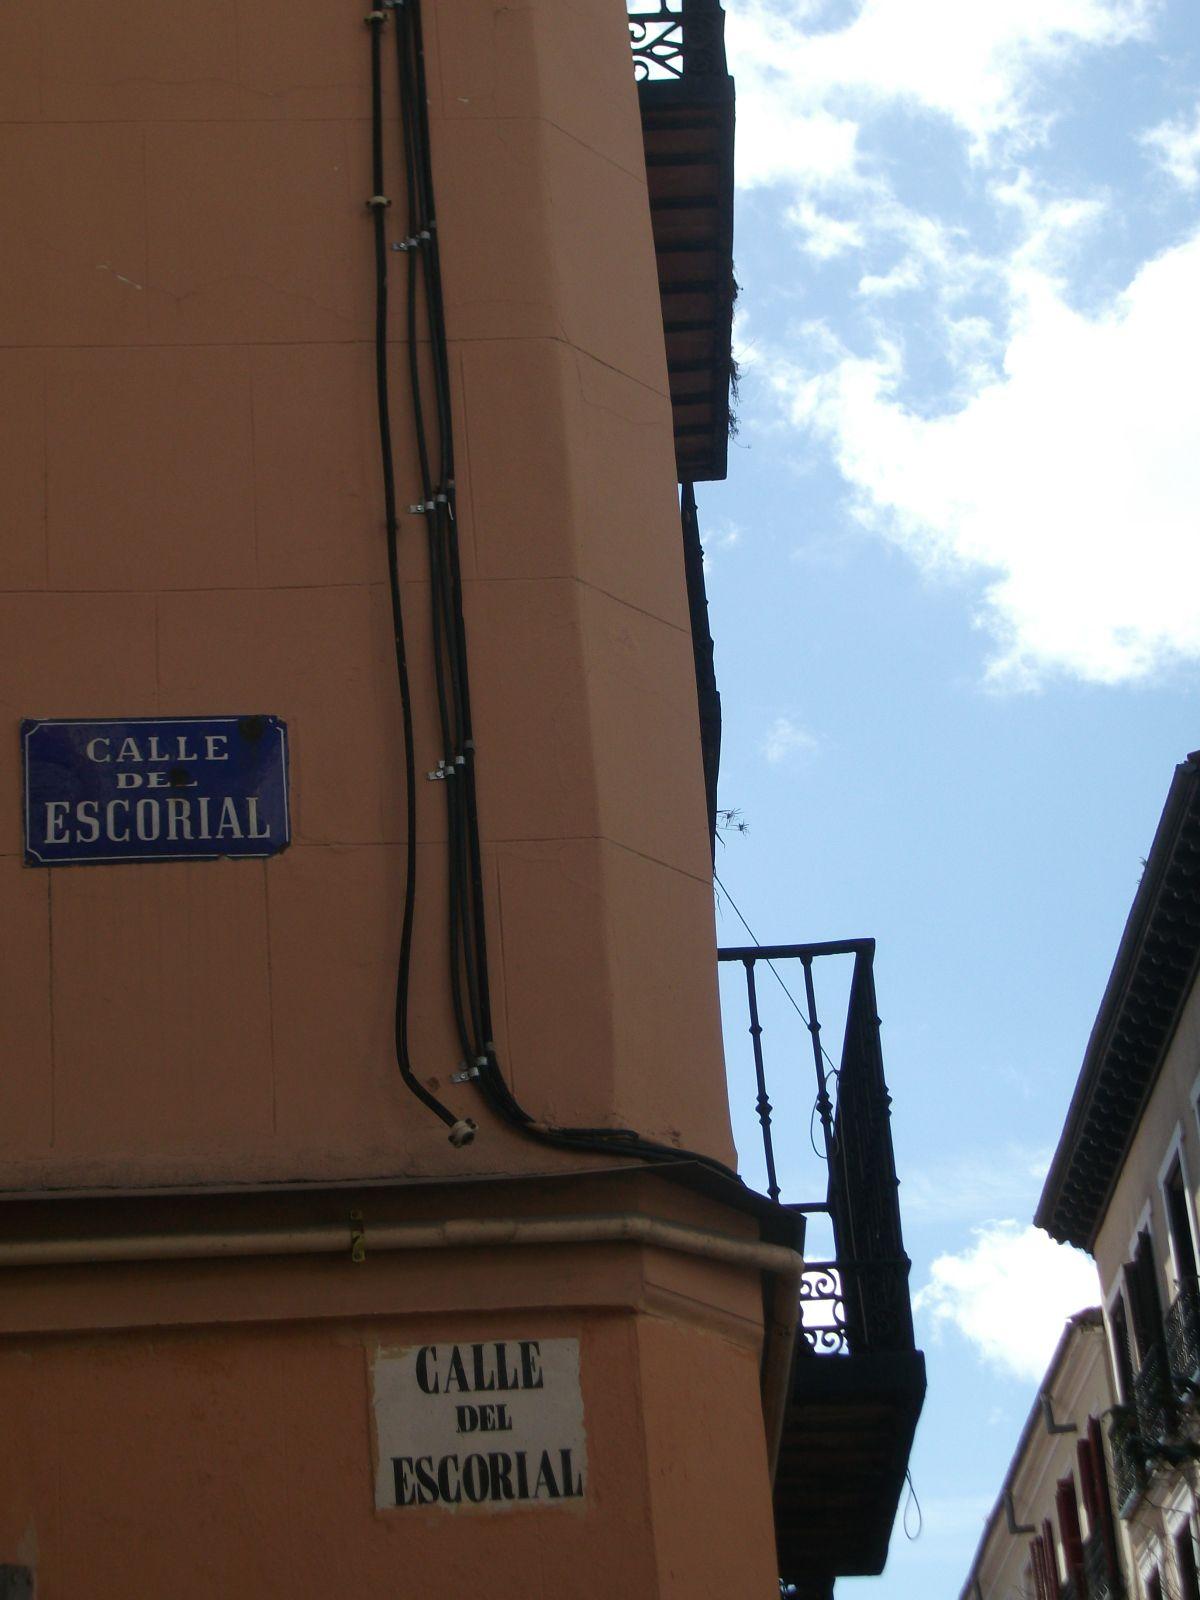 Esquina de la calle Escorial | CARPETANIA